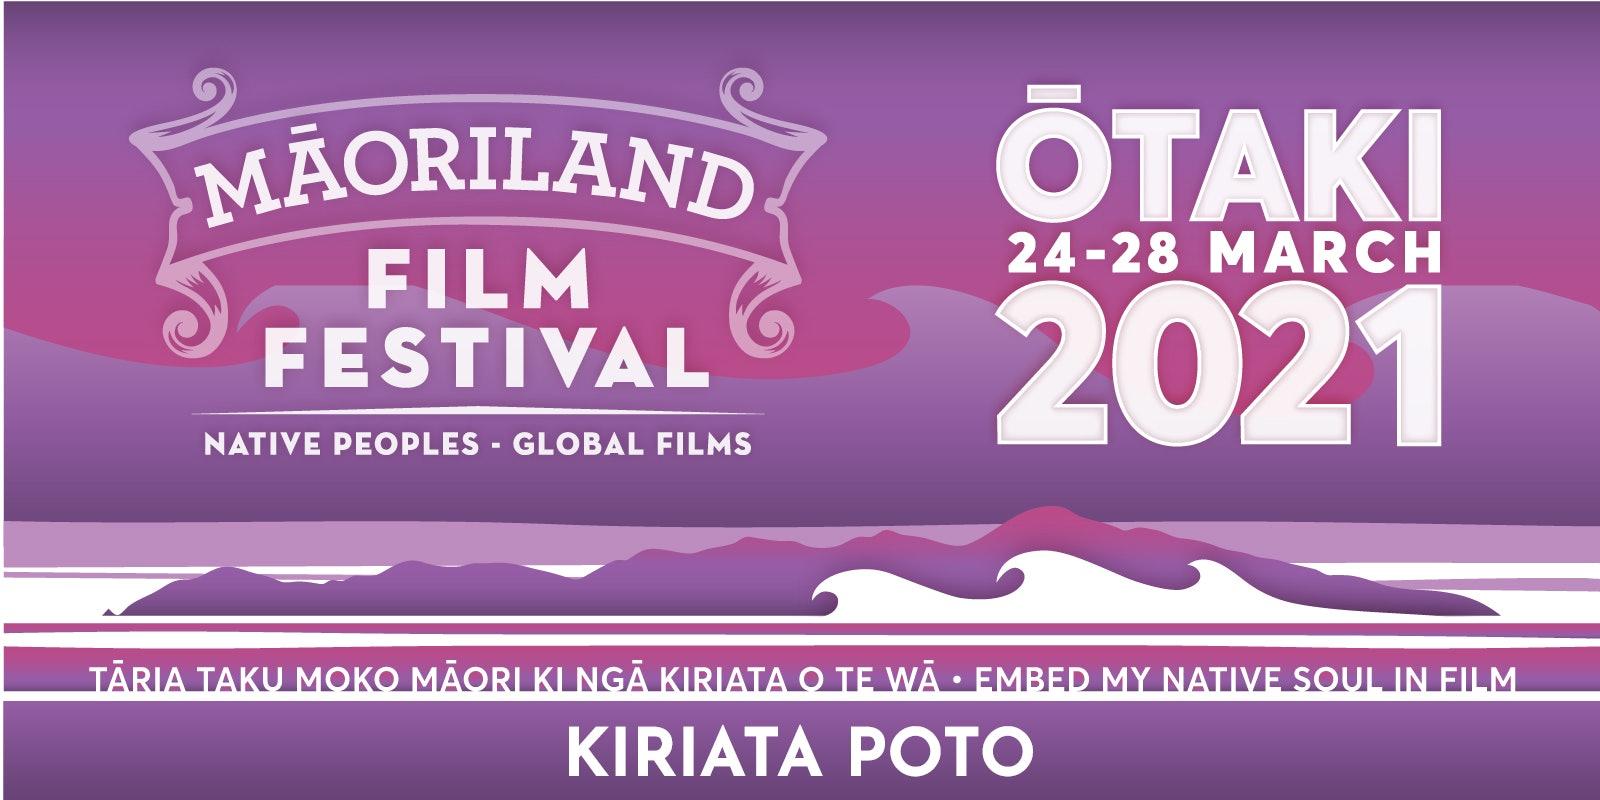 MAORILAND FILM FESTIVAL 2021 | Kiriata Poto - Short Films